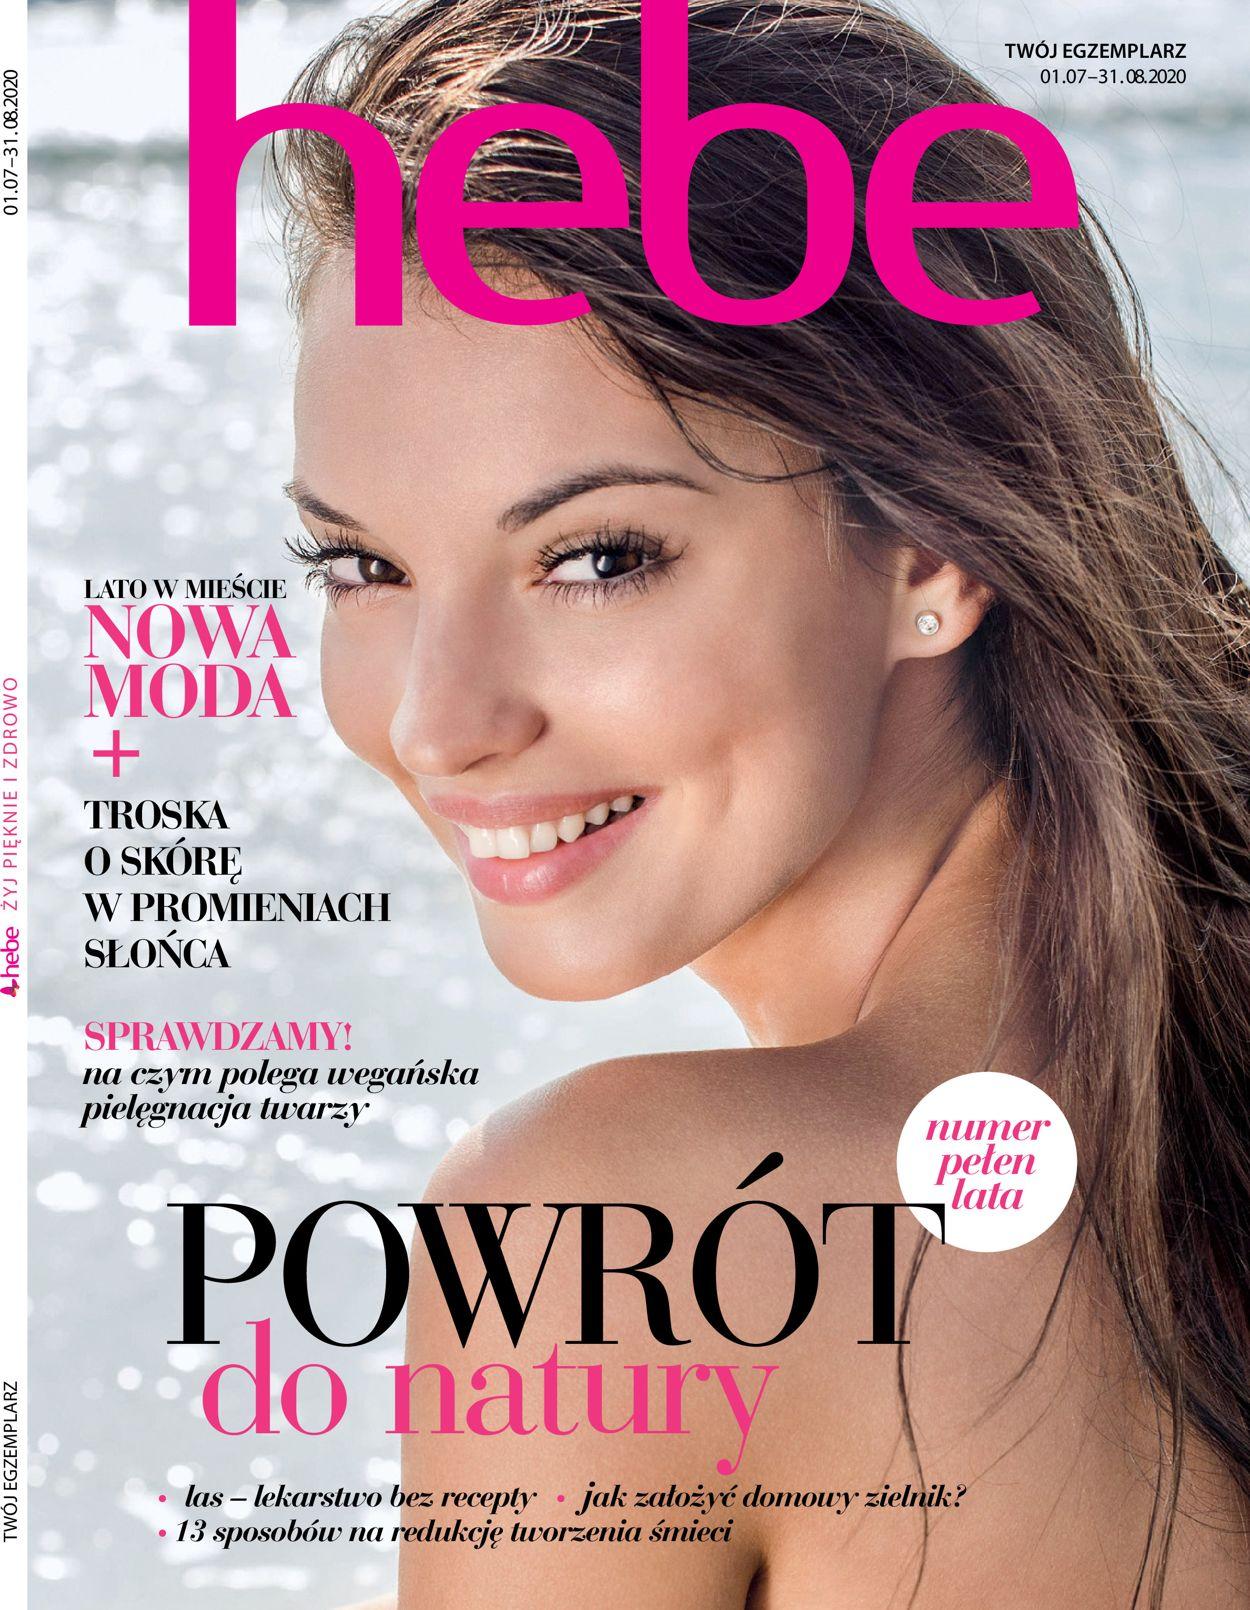 Gazetka promocyjna Hebe - 01.07-31.08.2020